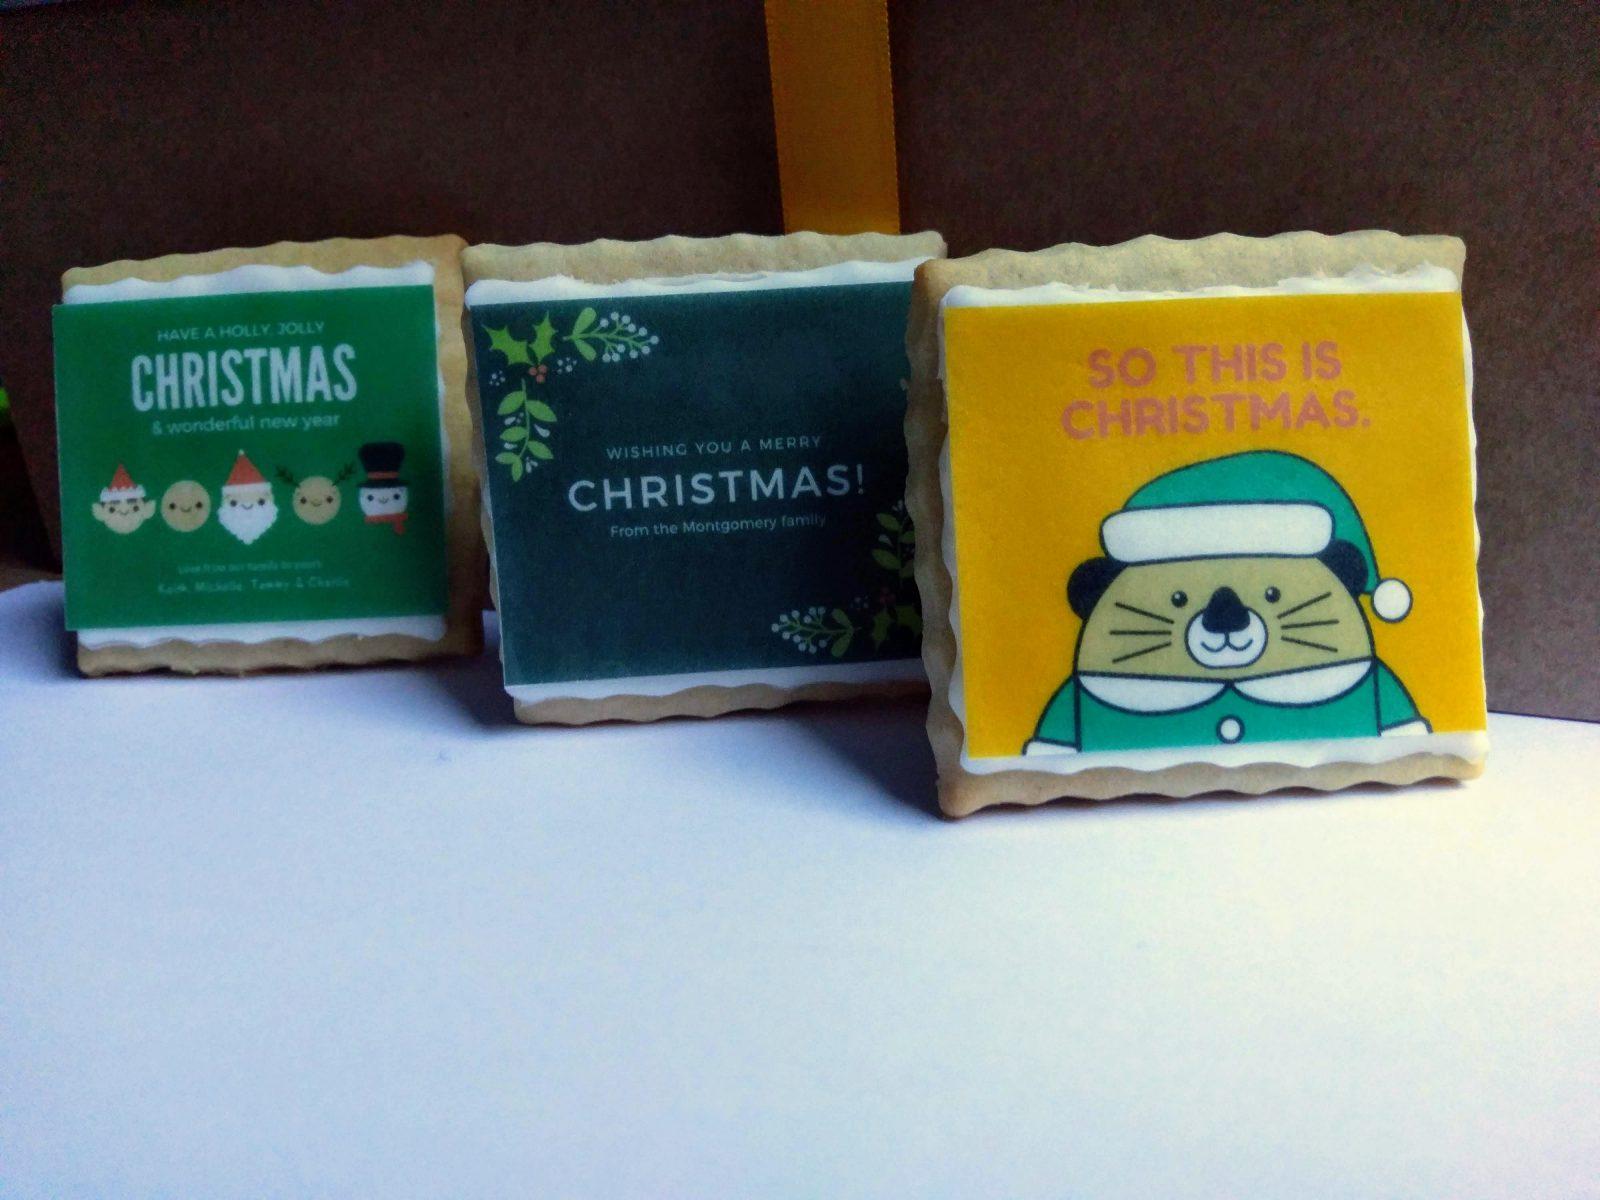 Edible Christmas card to send through the post